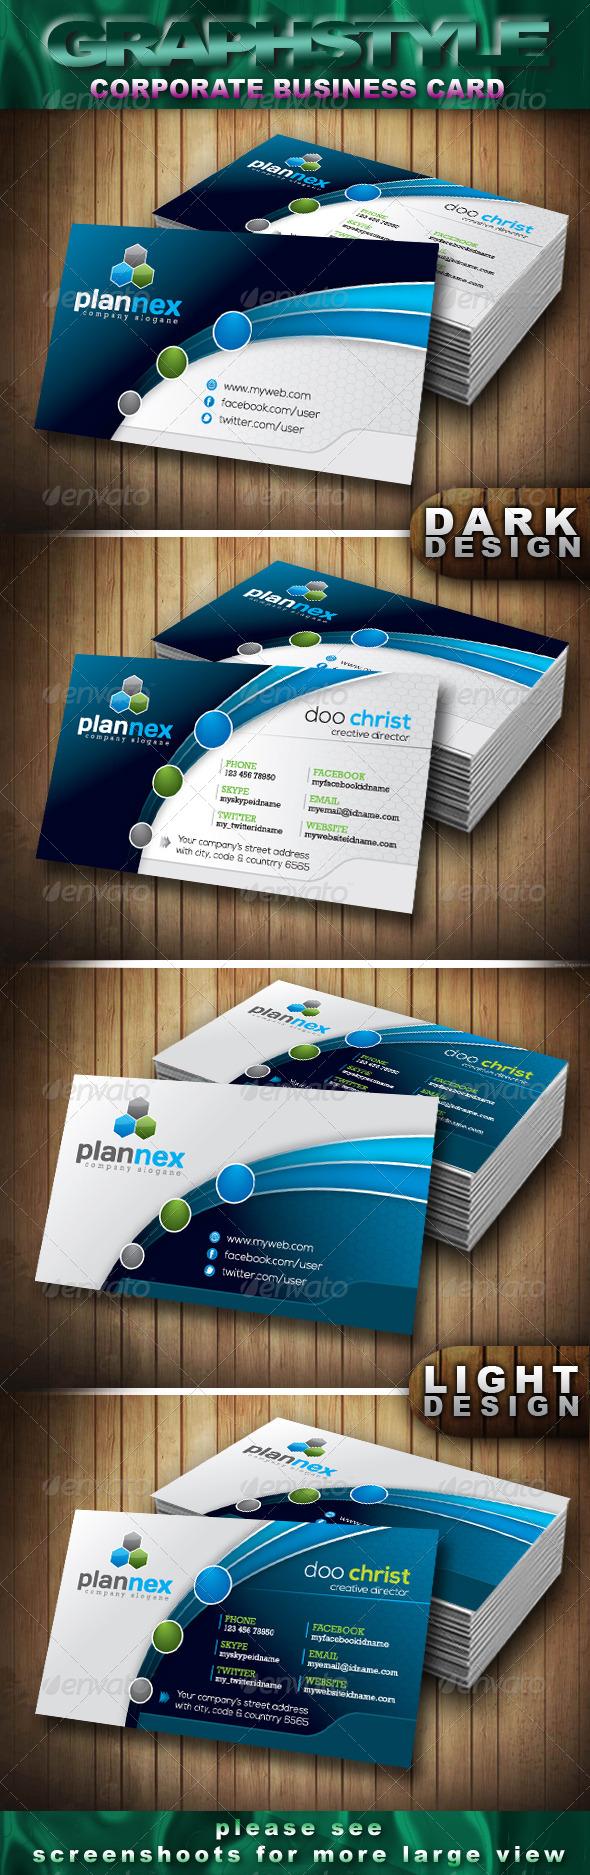 Plannex Corporate Business Card